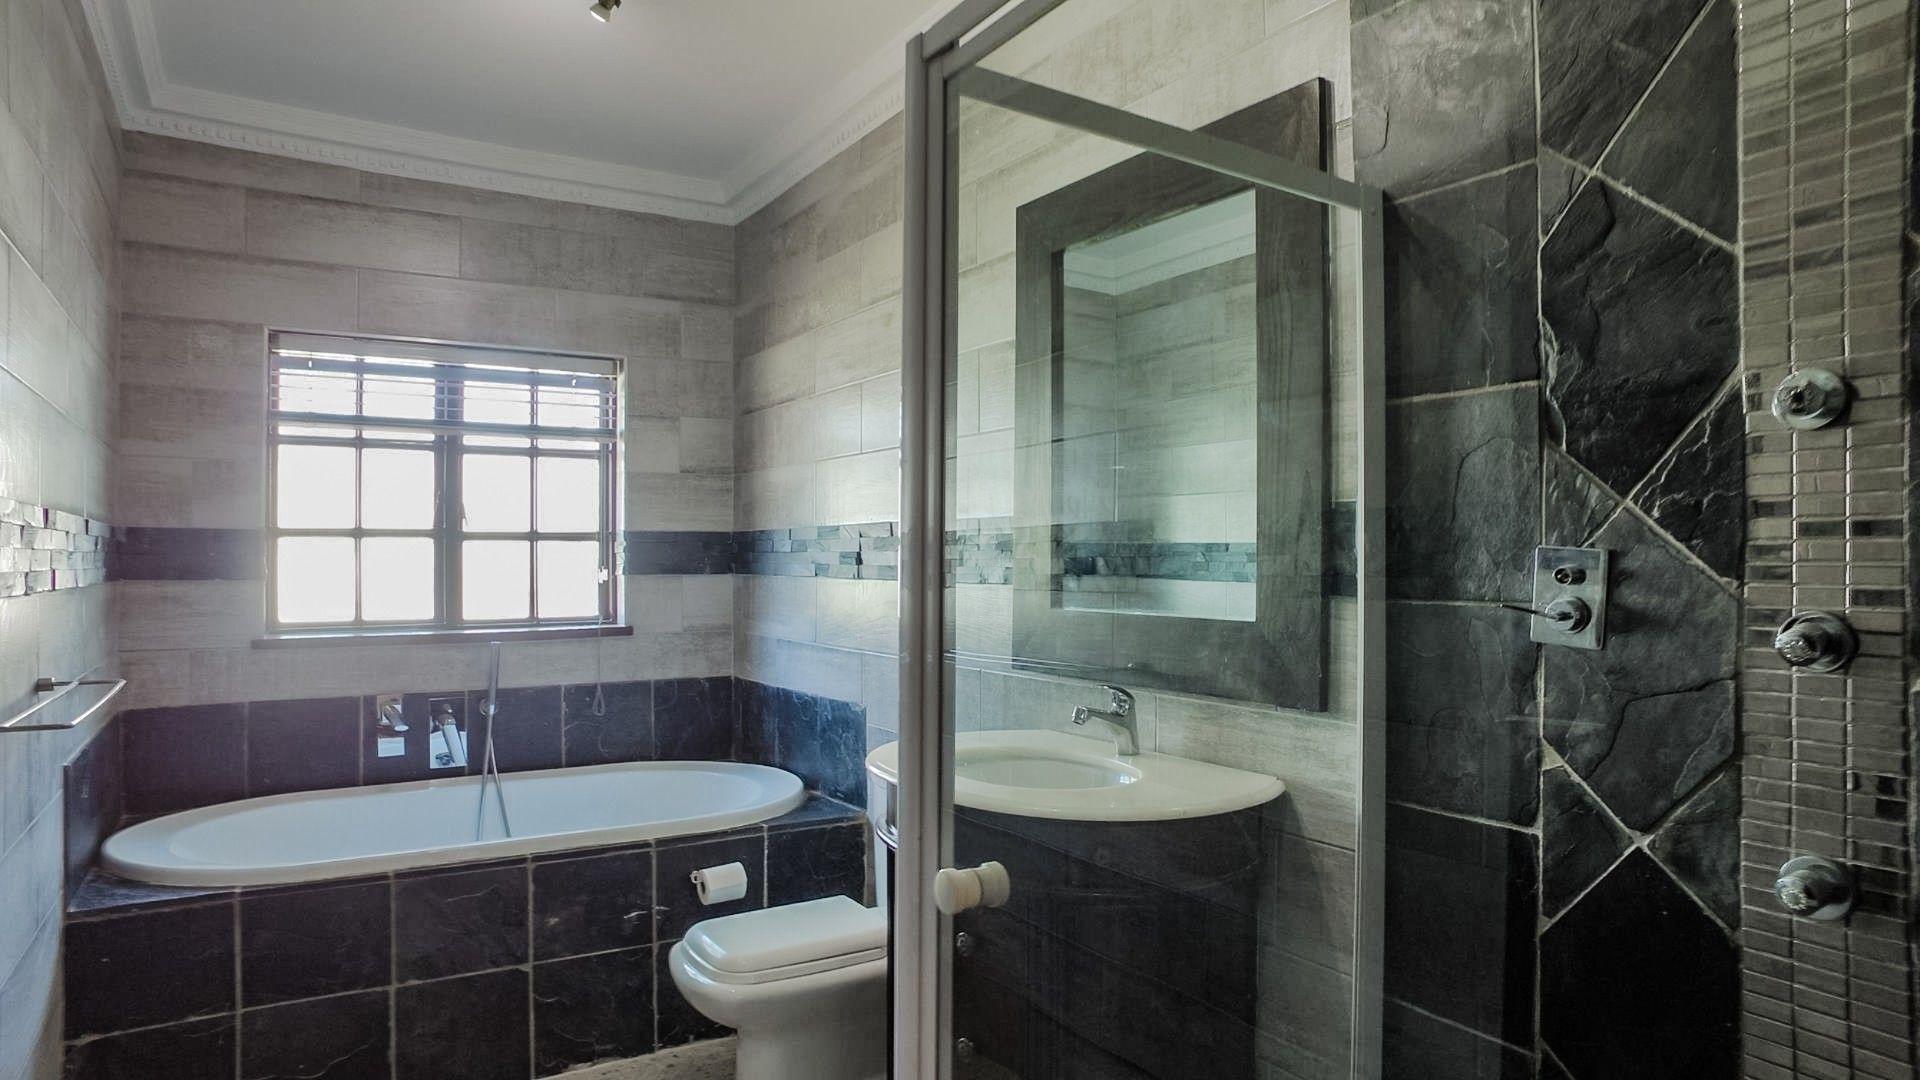 Lonehill 2nd bathroomm.jpg